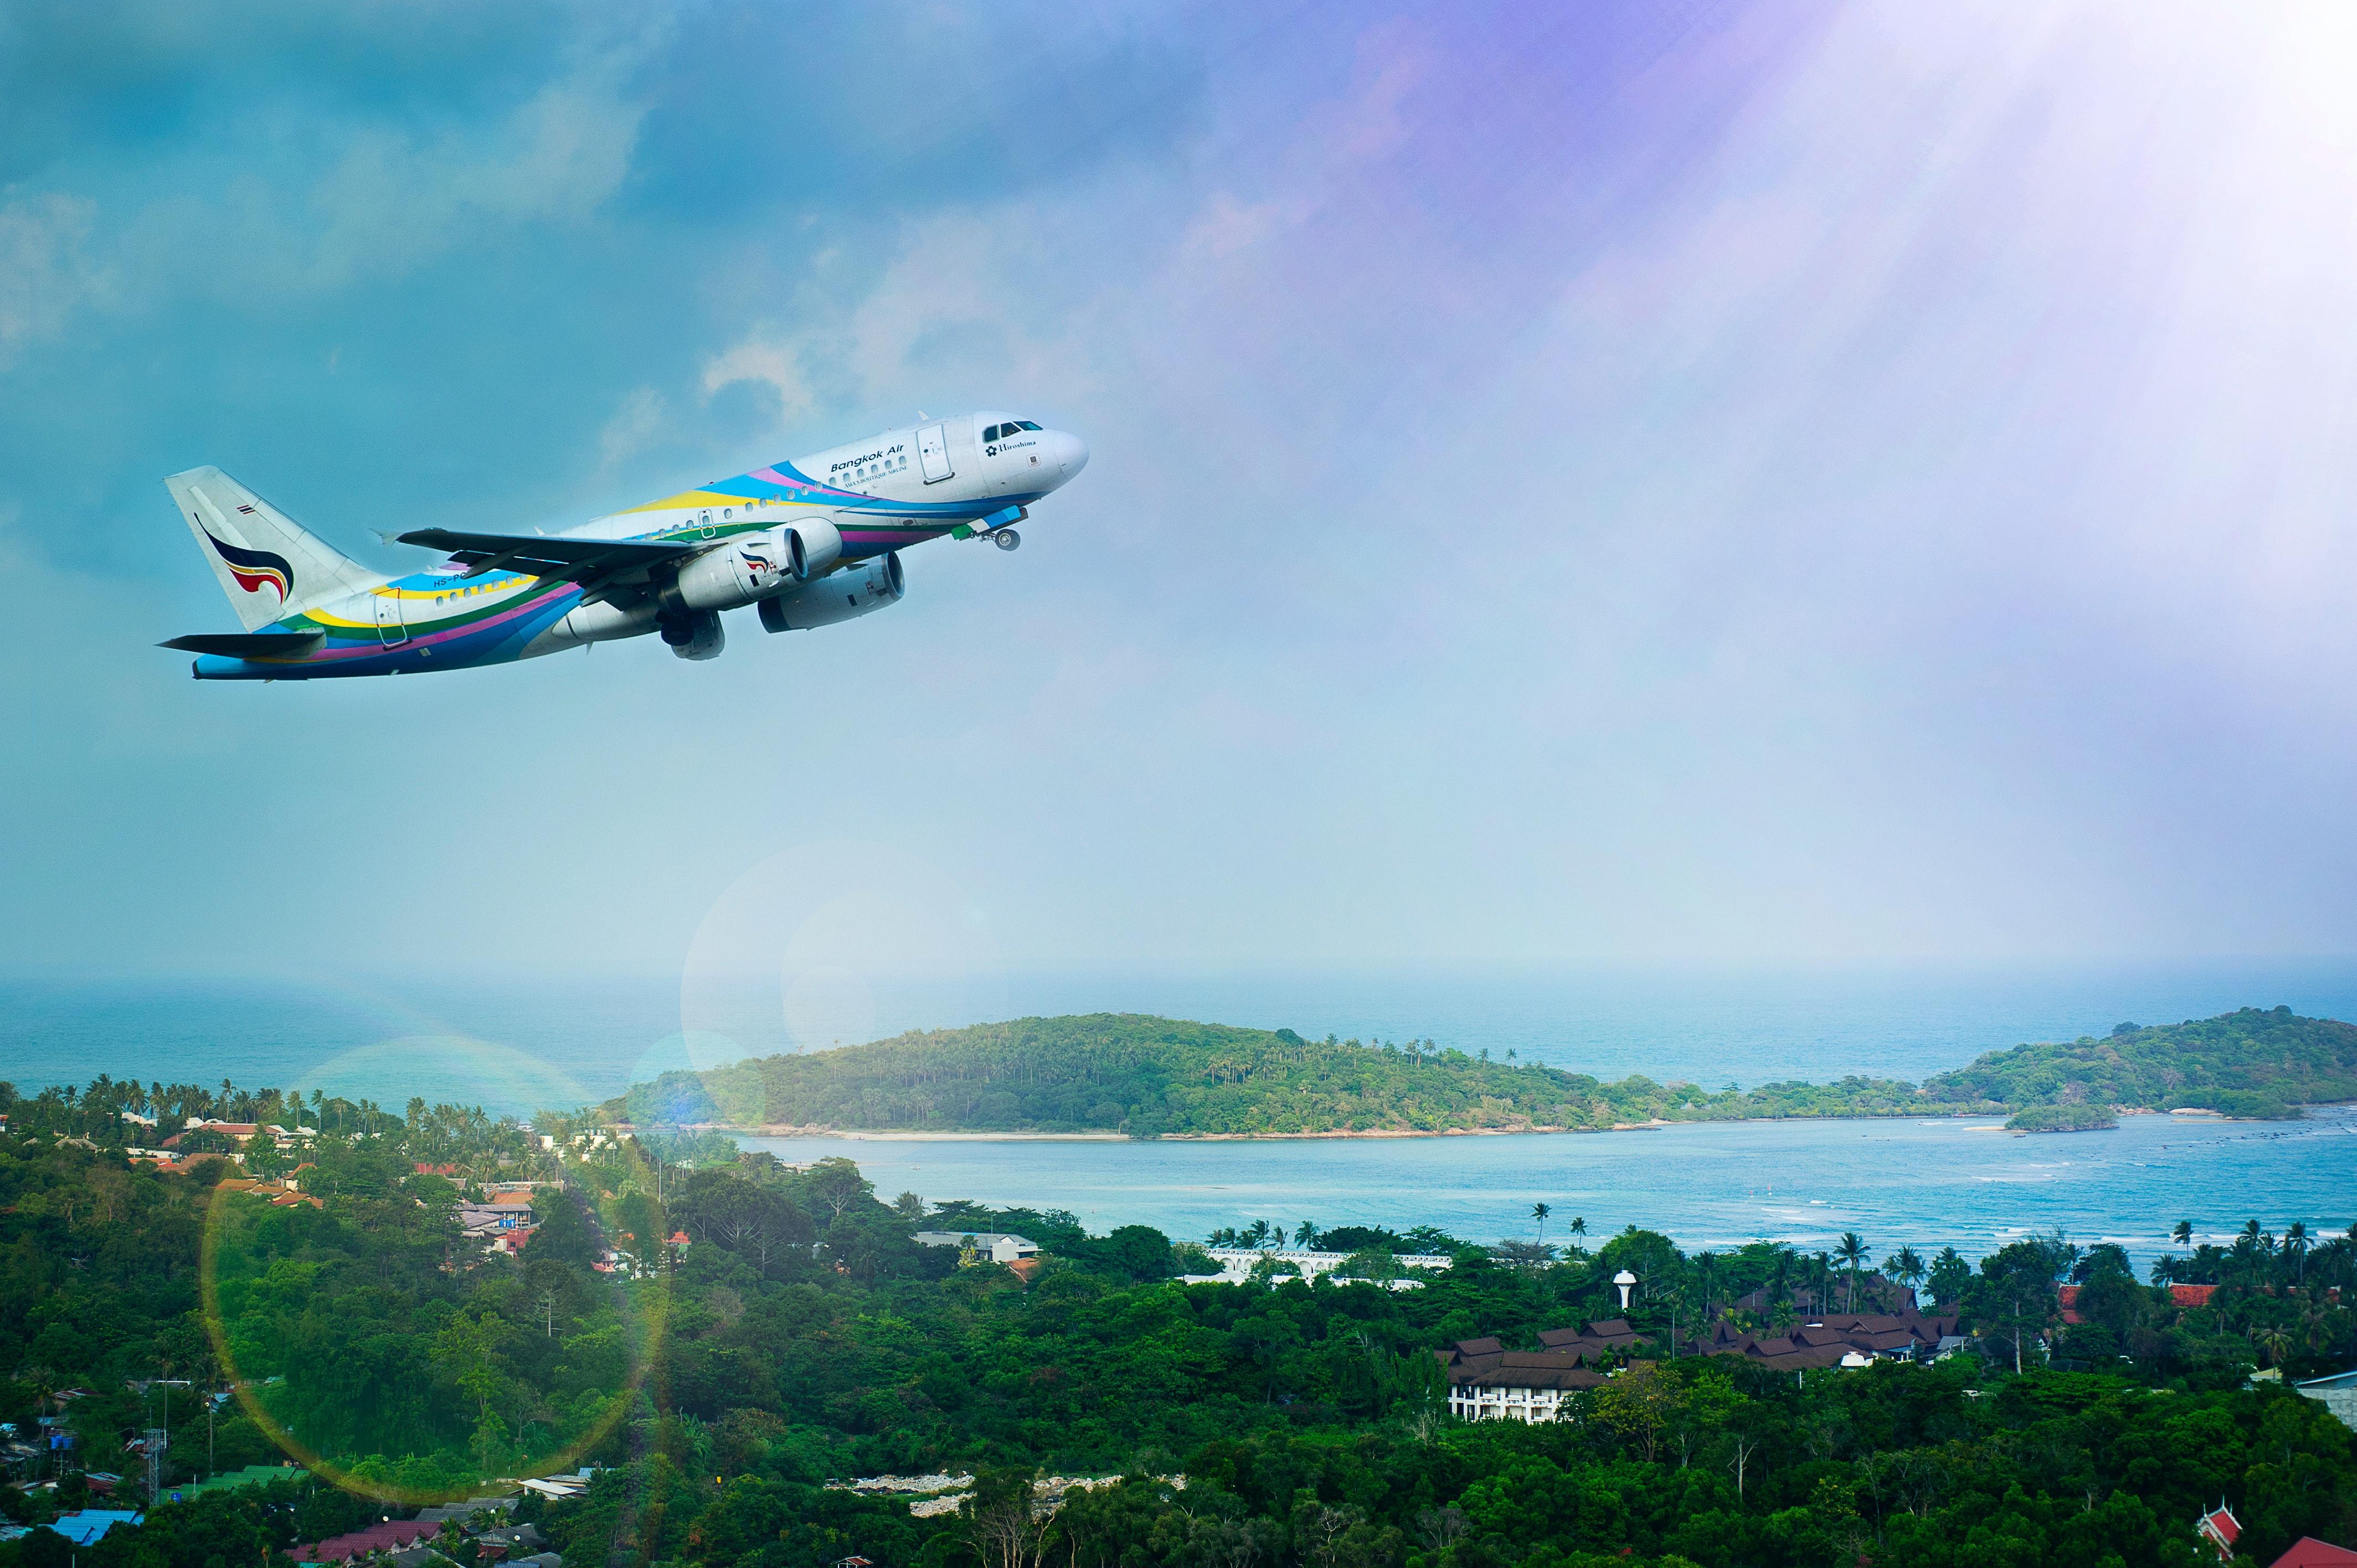 500 Flugzeug Fotos Pexels Kostenlose Stock Fotos